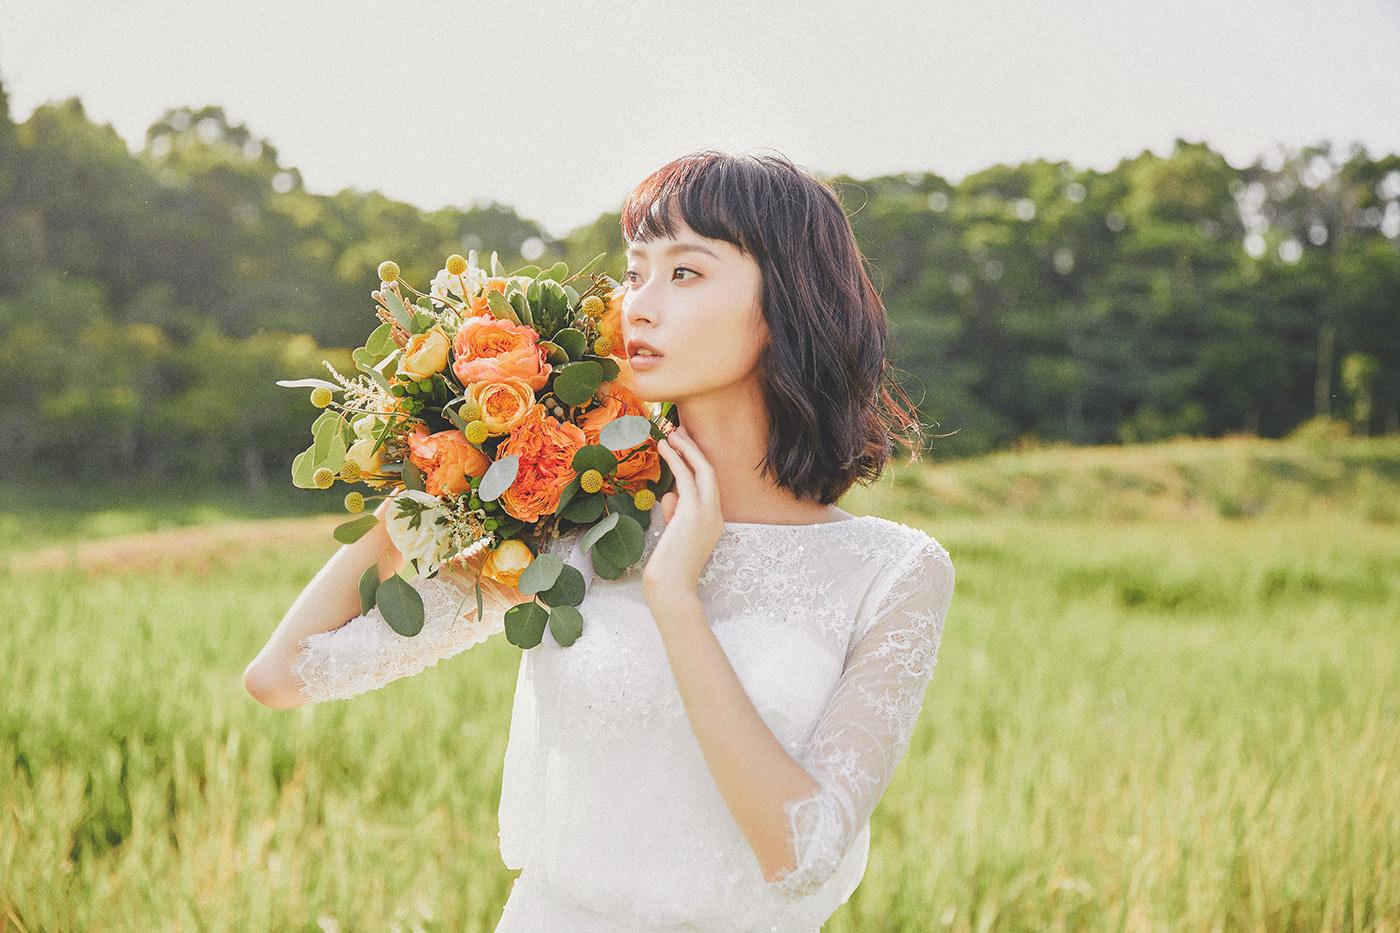 Summer orange | 夏橘 /фото Dalton 周